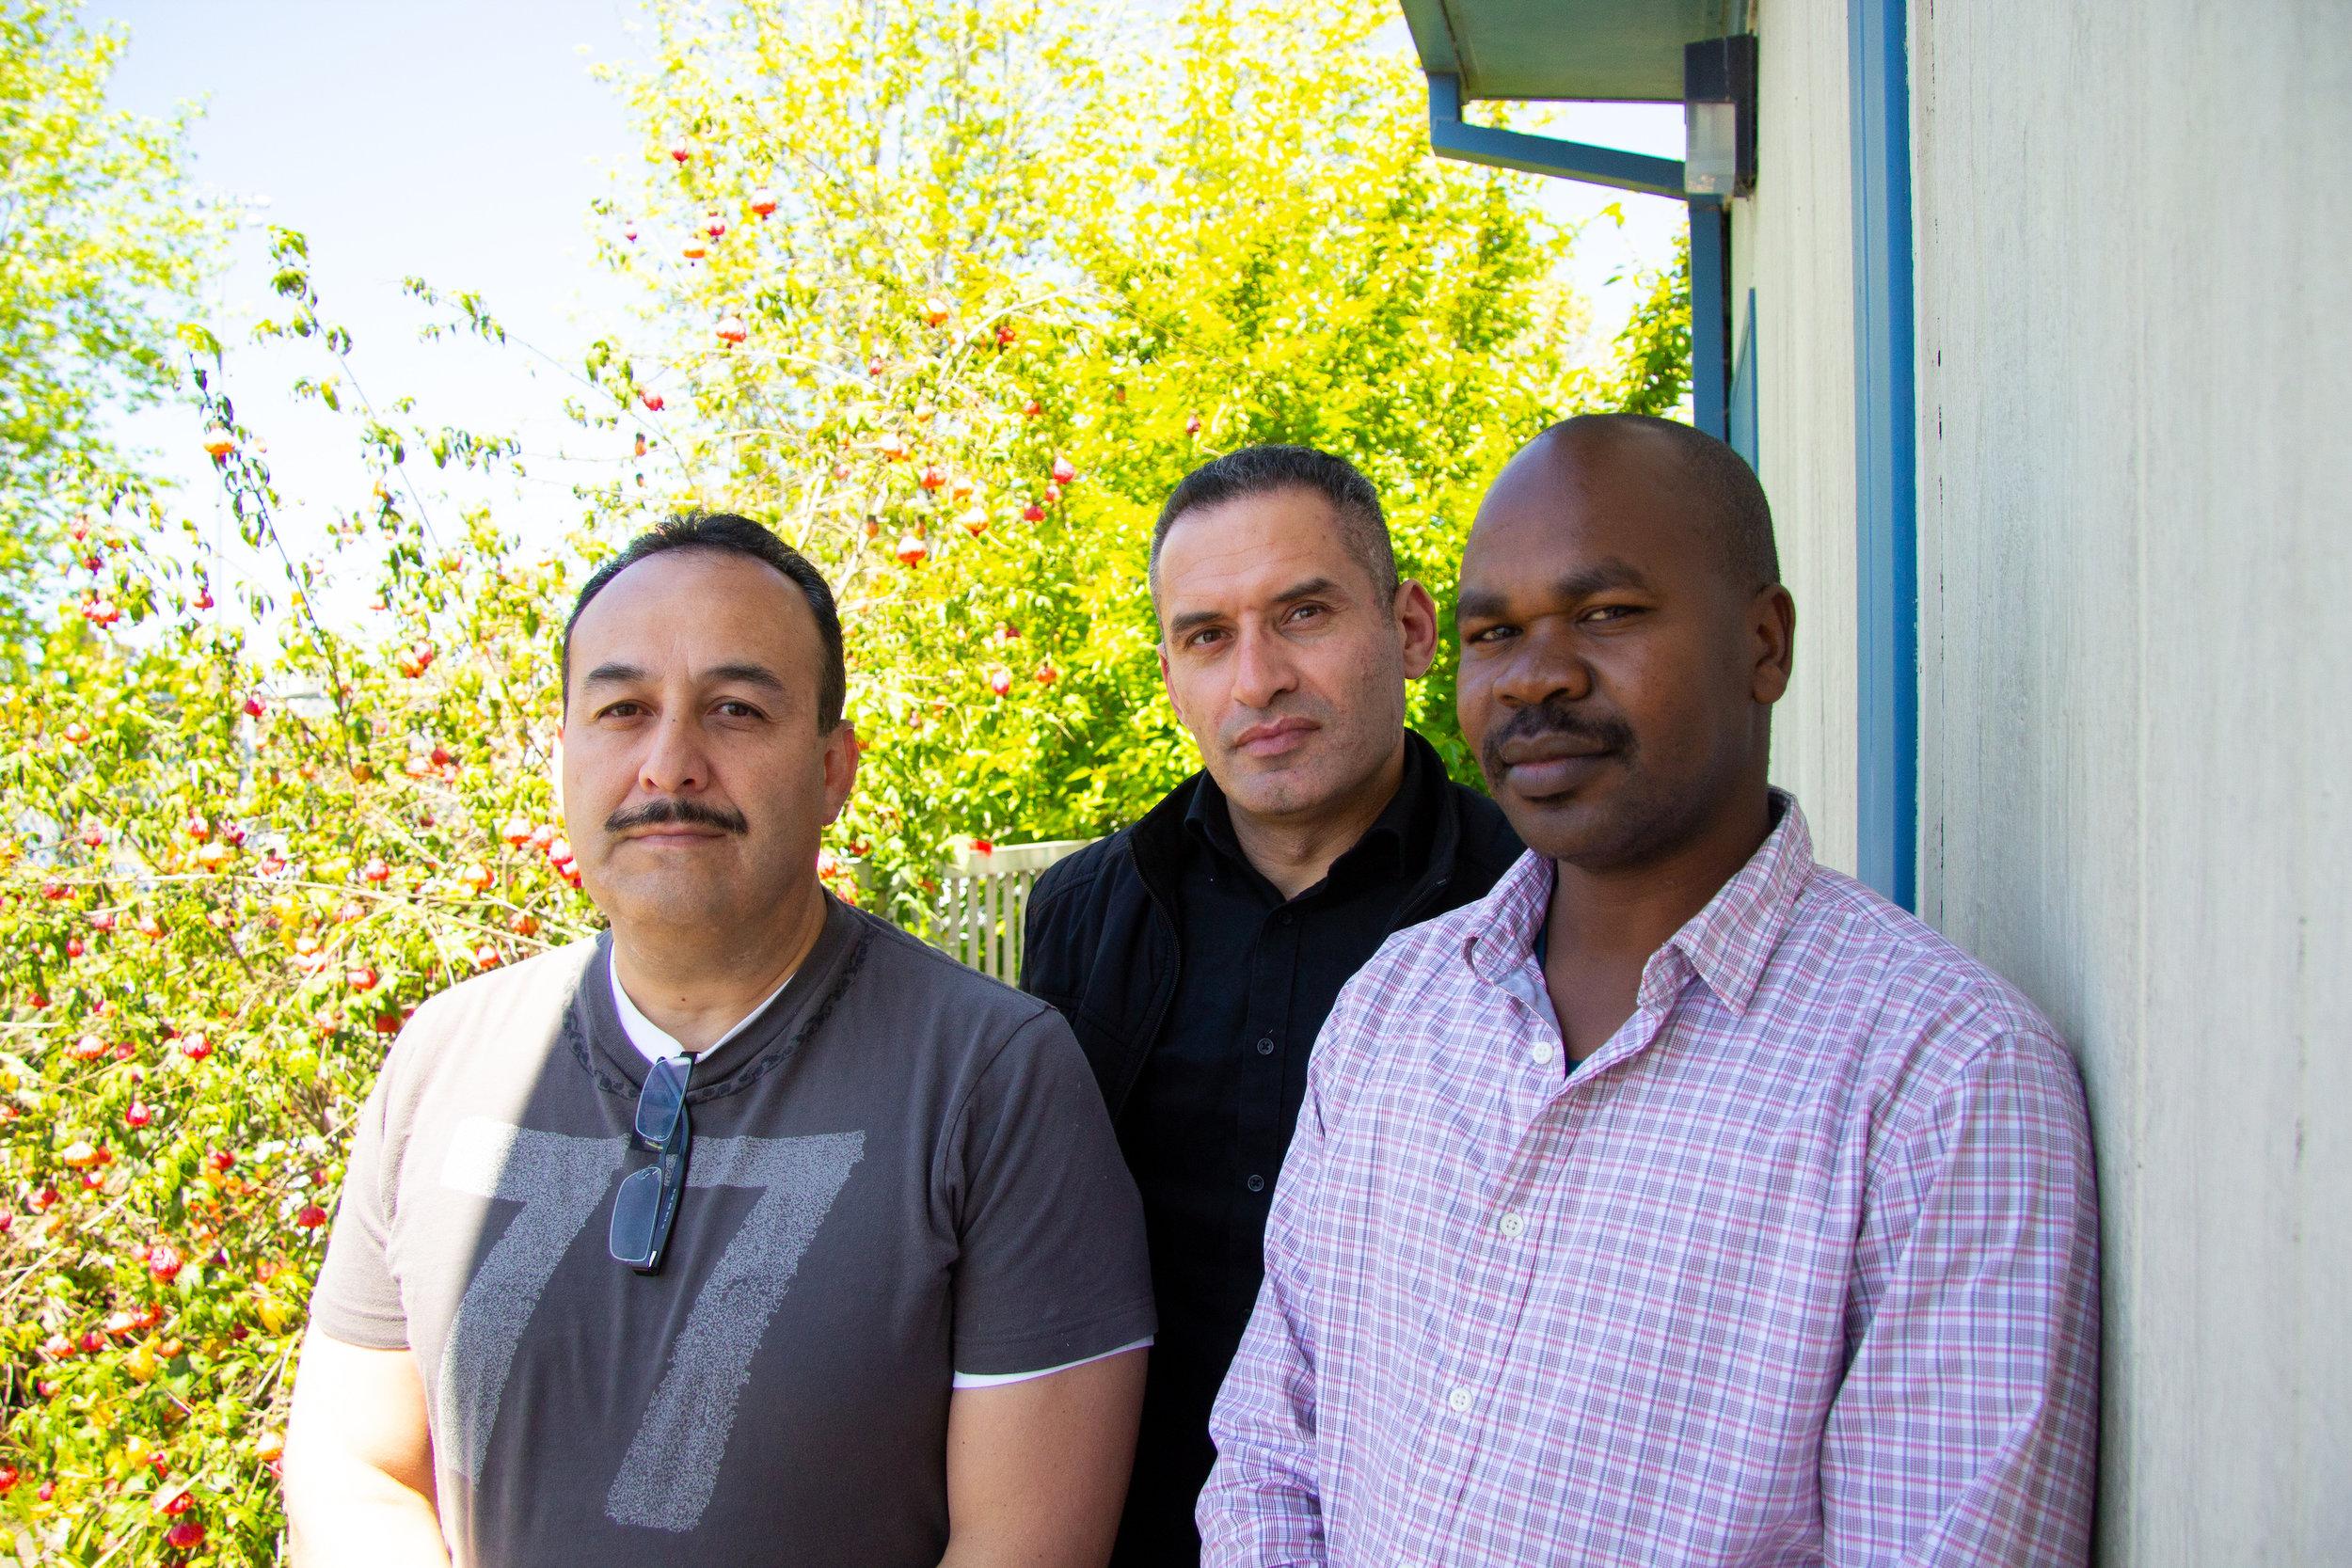 Luis Hernandez, Alzubair Emam & Ghani Moussaoui